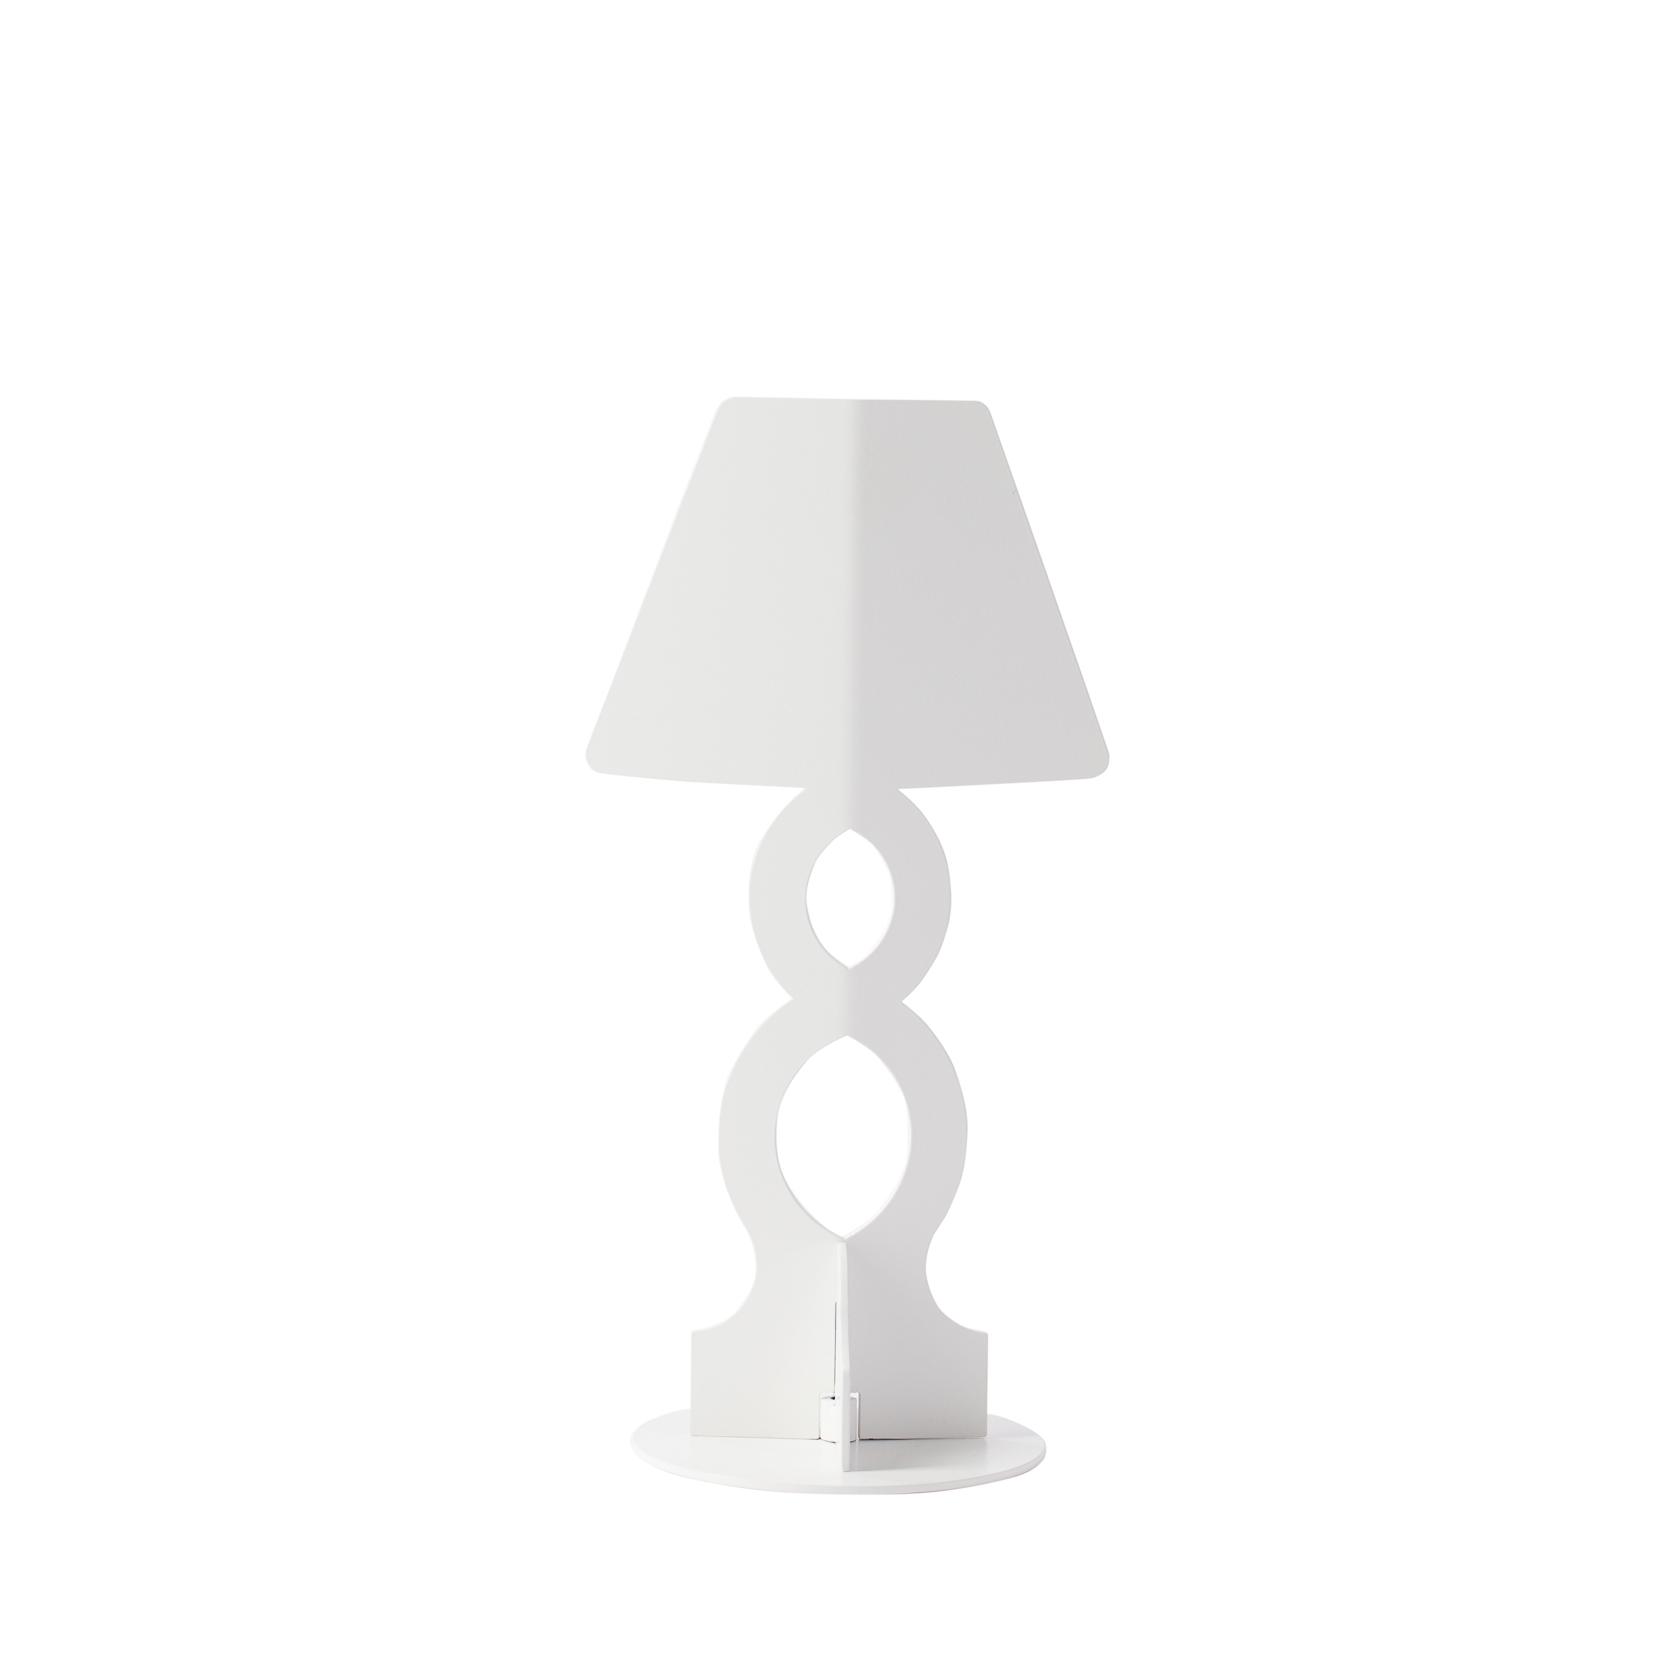 Hua design lampada da tavolo infinity white tattahome - Lampada da tavolo design ...